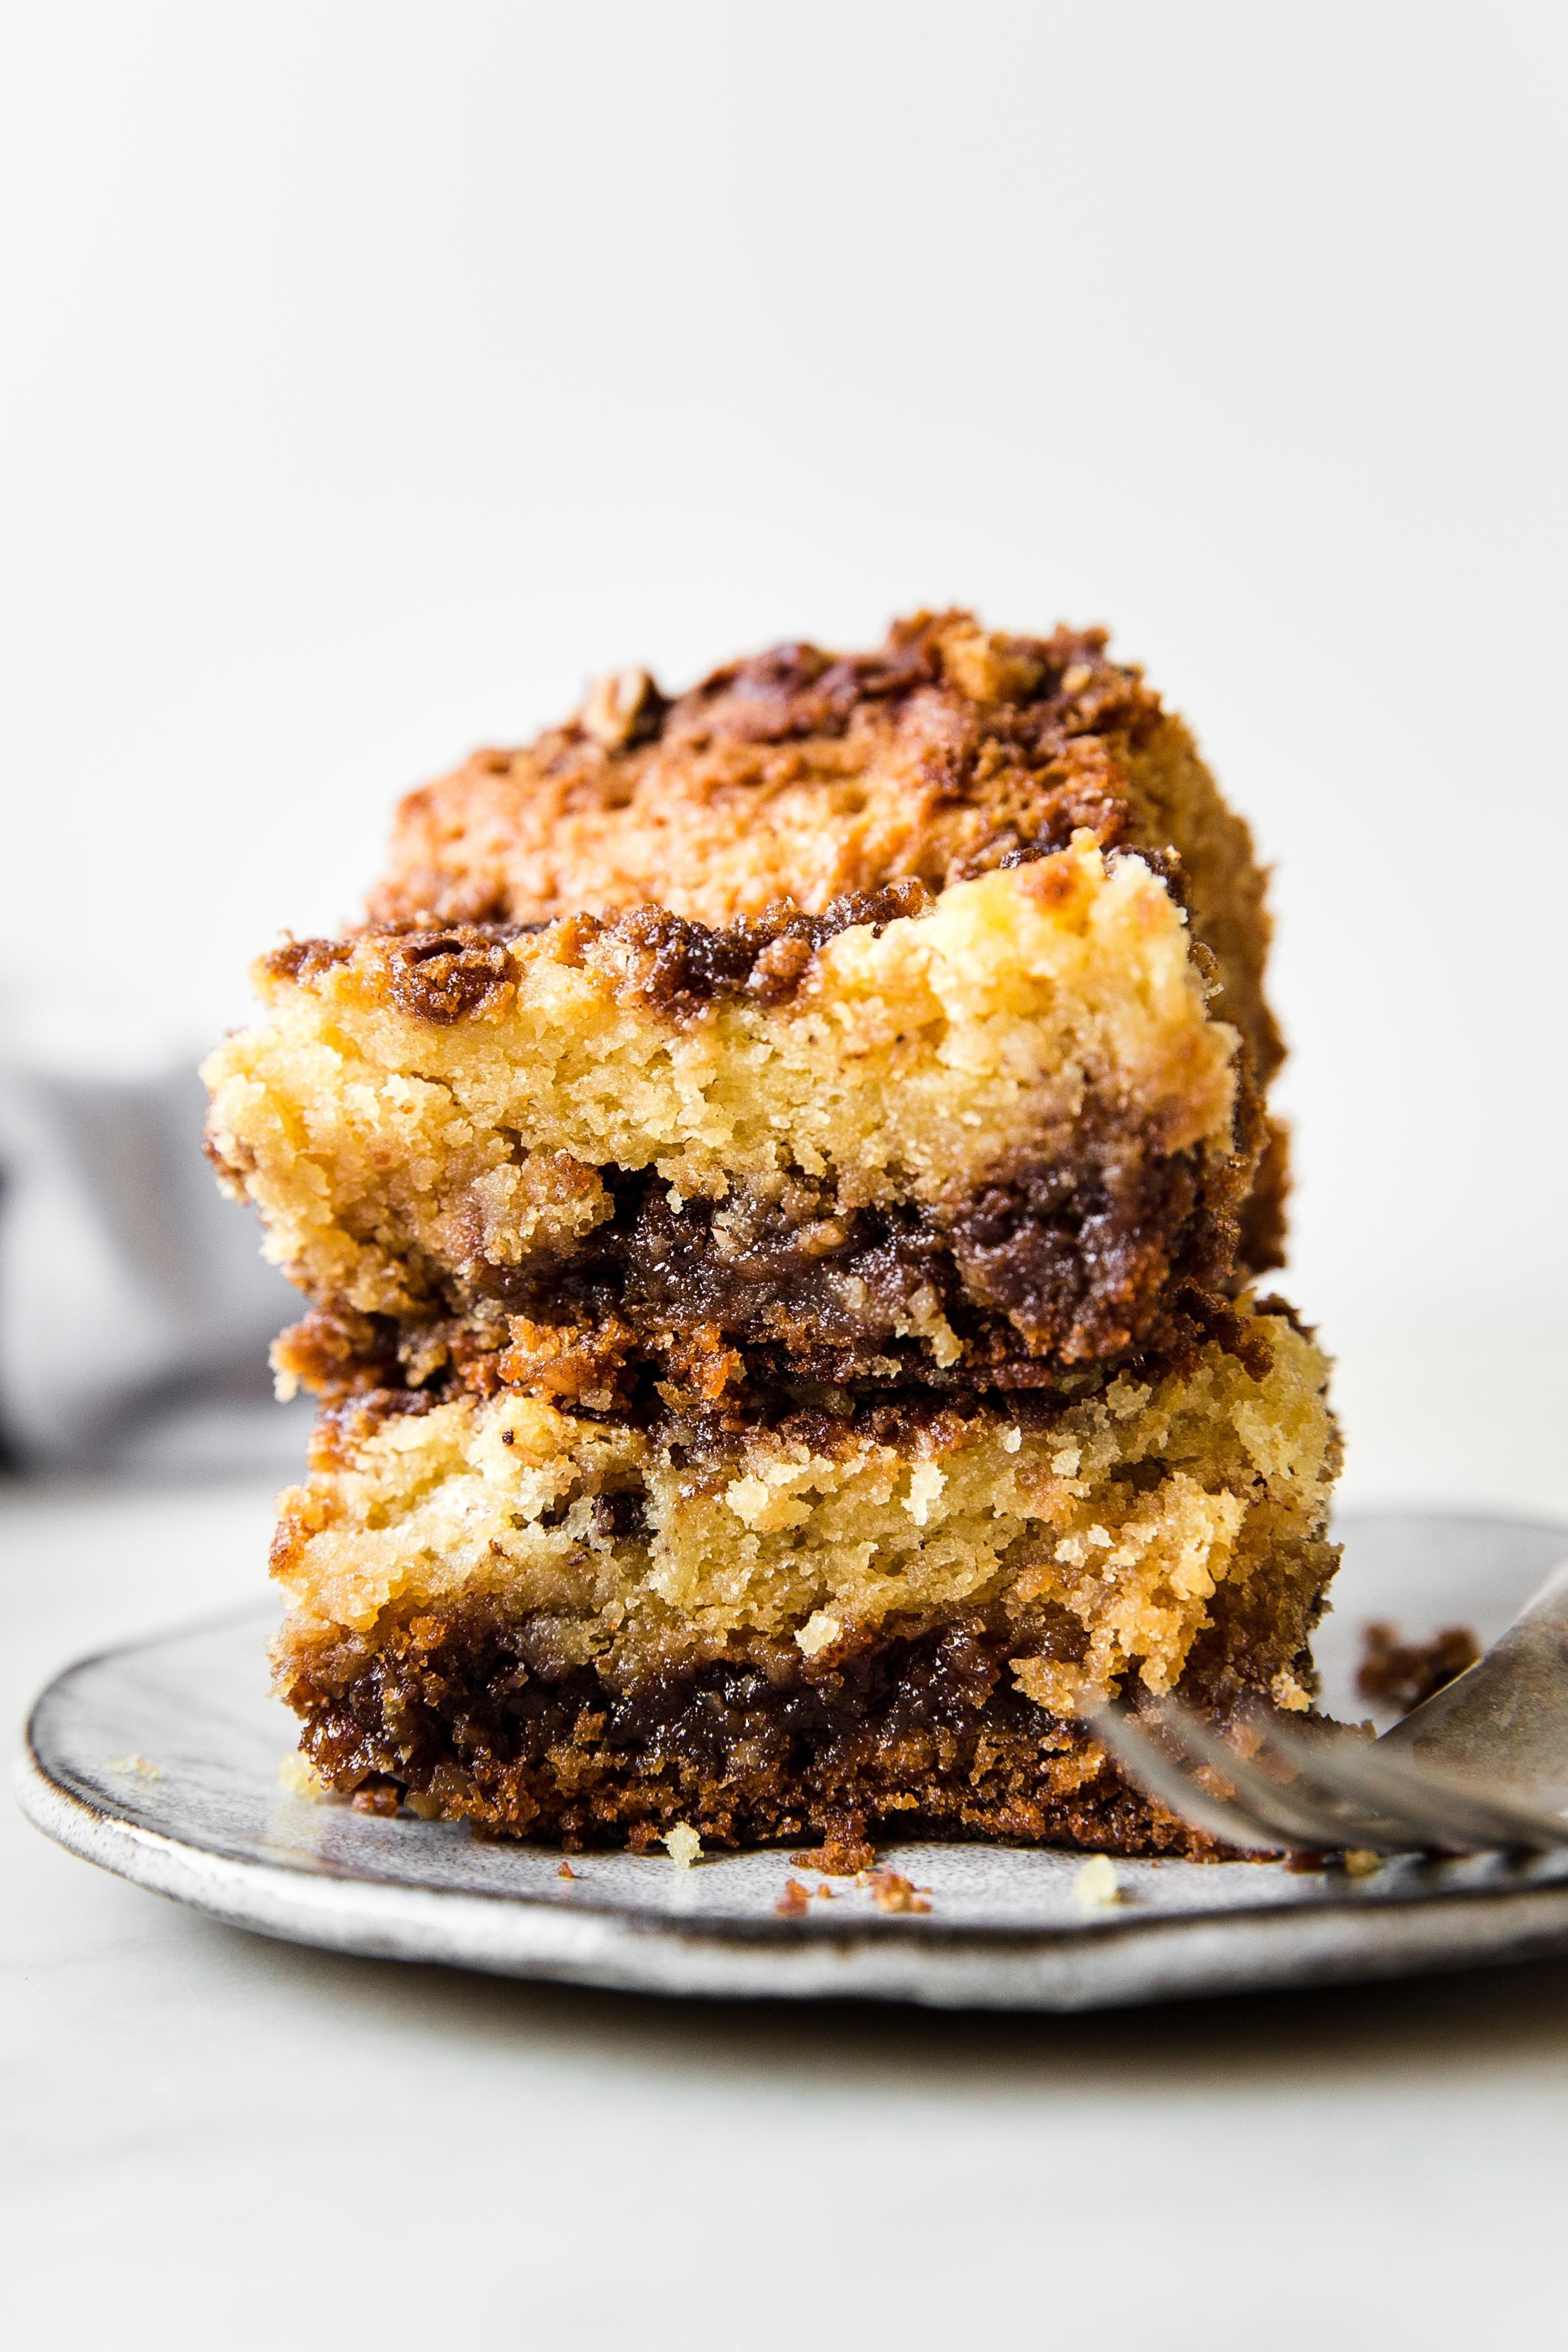 Sour Cream Coffee Cake The Modern Proper Recipe In 2020 Sour Cream Coffee Cake Coffee Cake Coffee Cake Recipes Easy